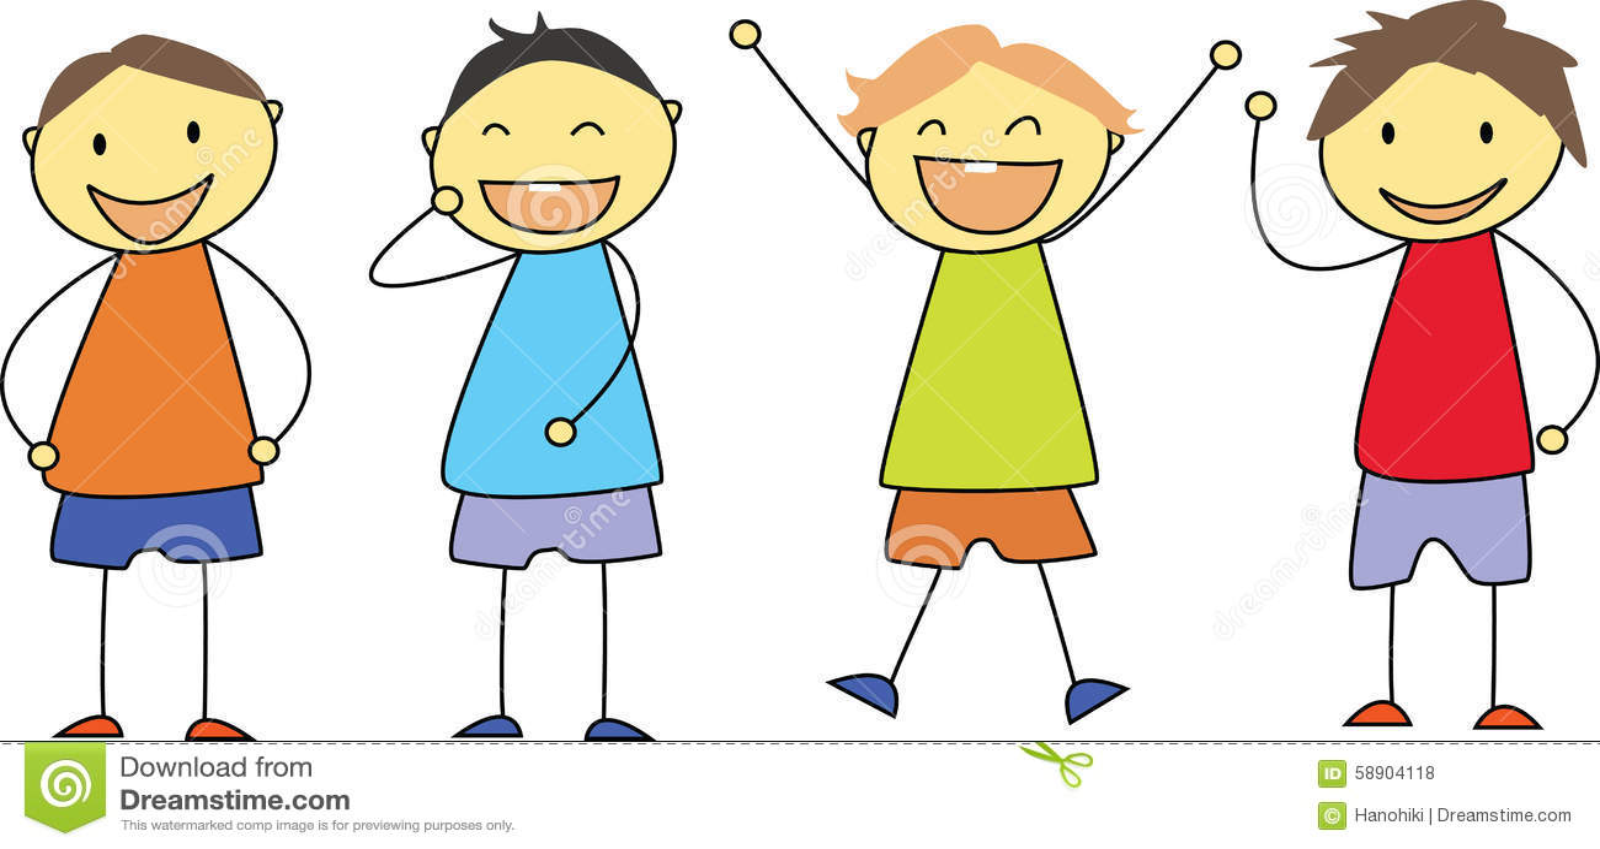 Kids Drawing - Happy Children Smiling Stock Vector - Image: 58904118